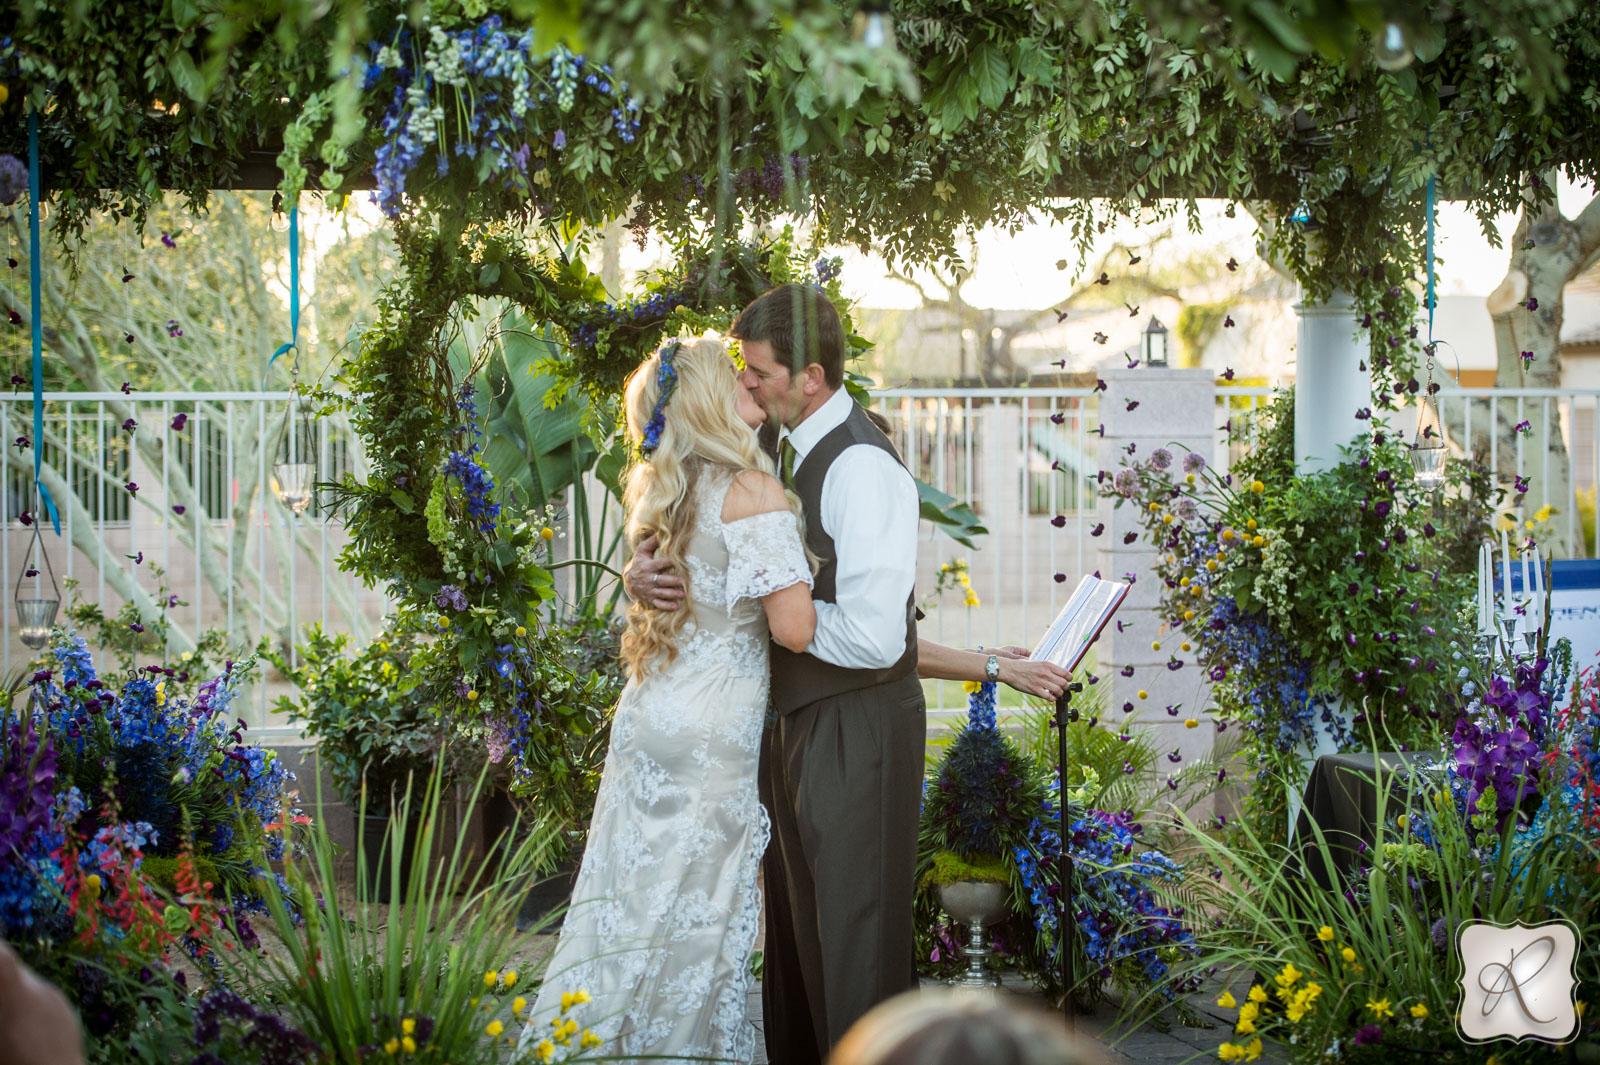 Shannon & Scott's Phoenix Wedding